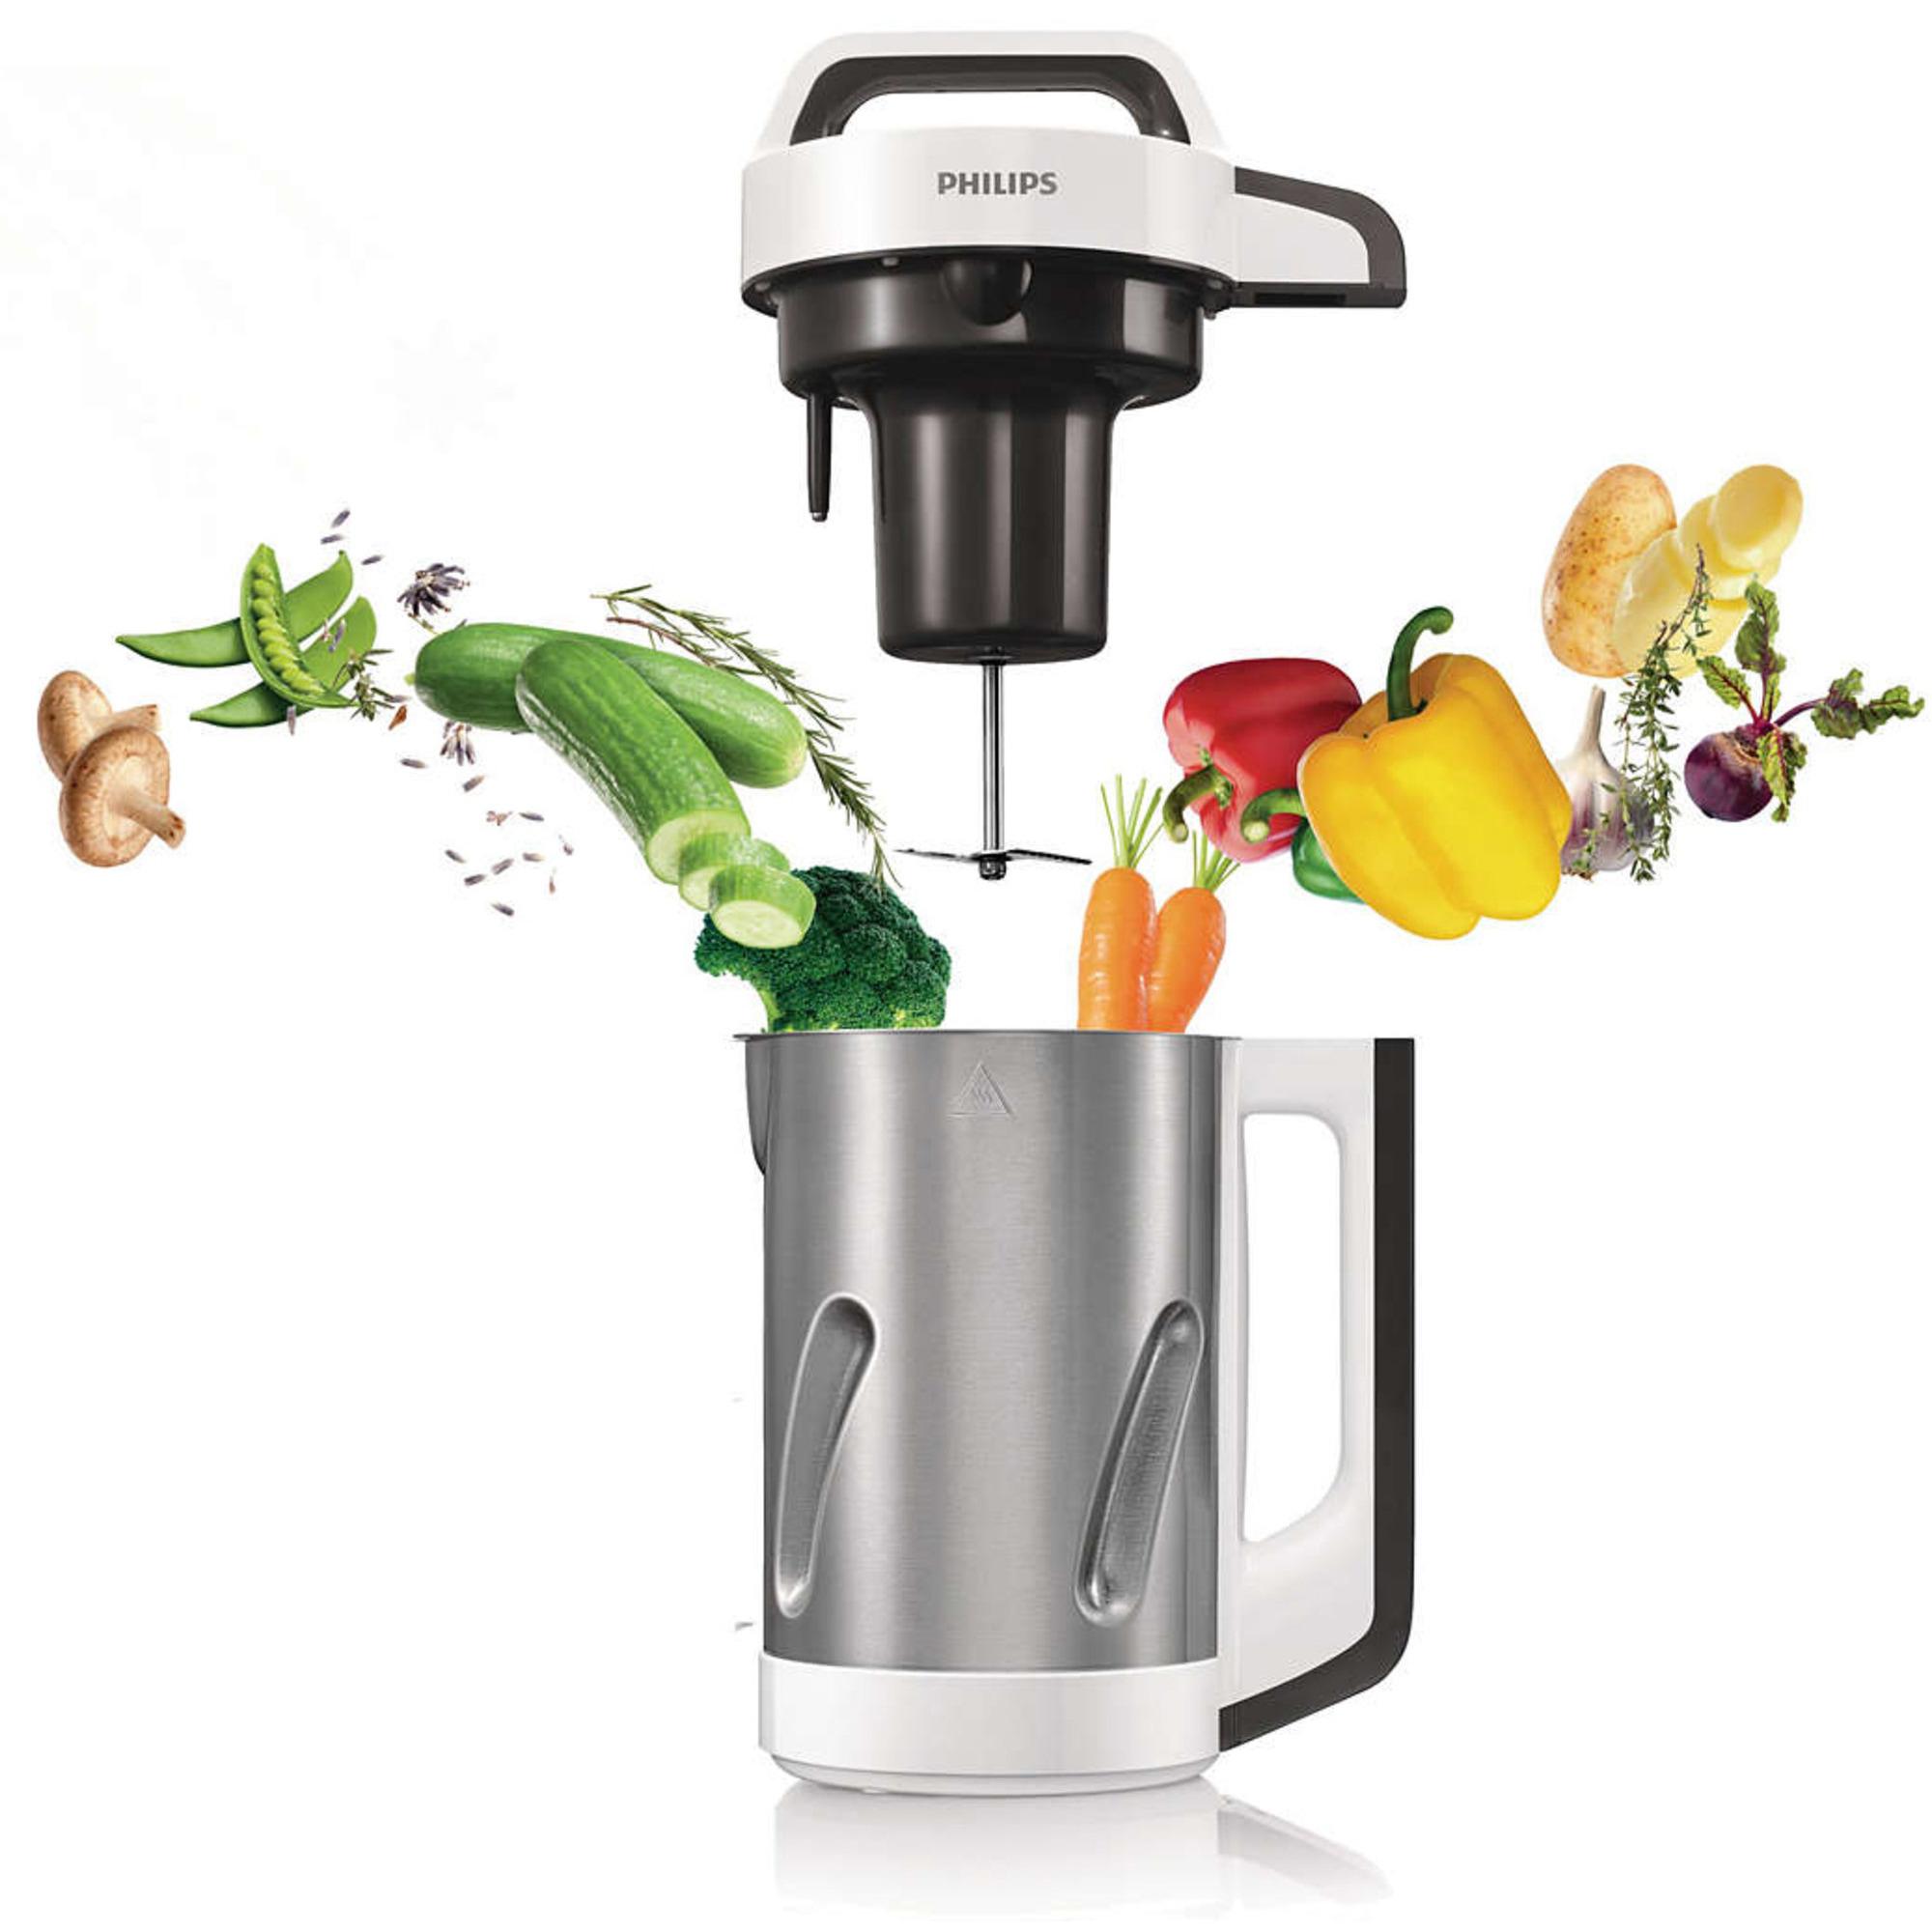 HR2201 Viva SoupMaker Fra Philips » Suppe På 20 Minutter